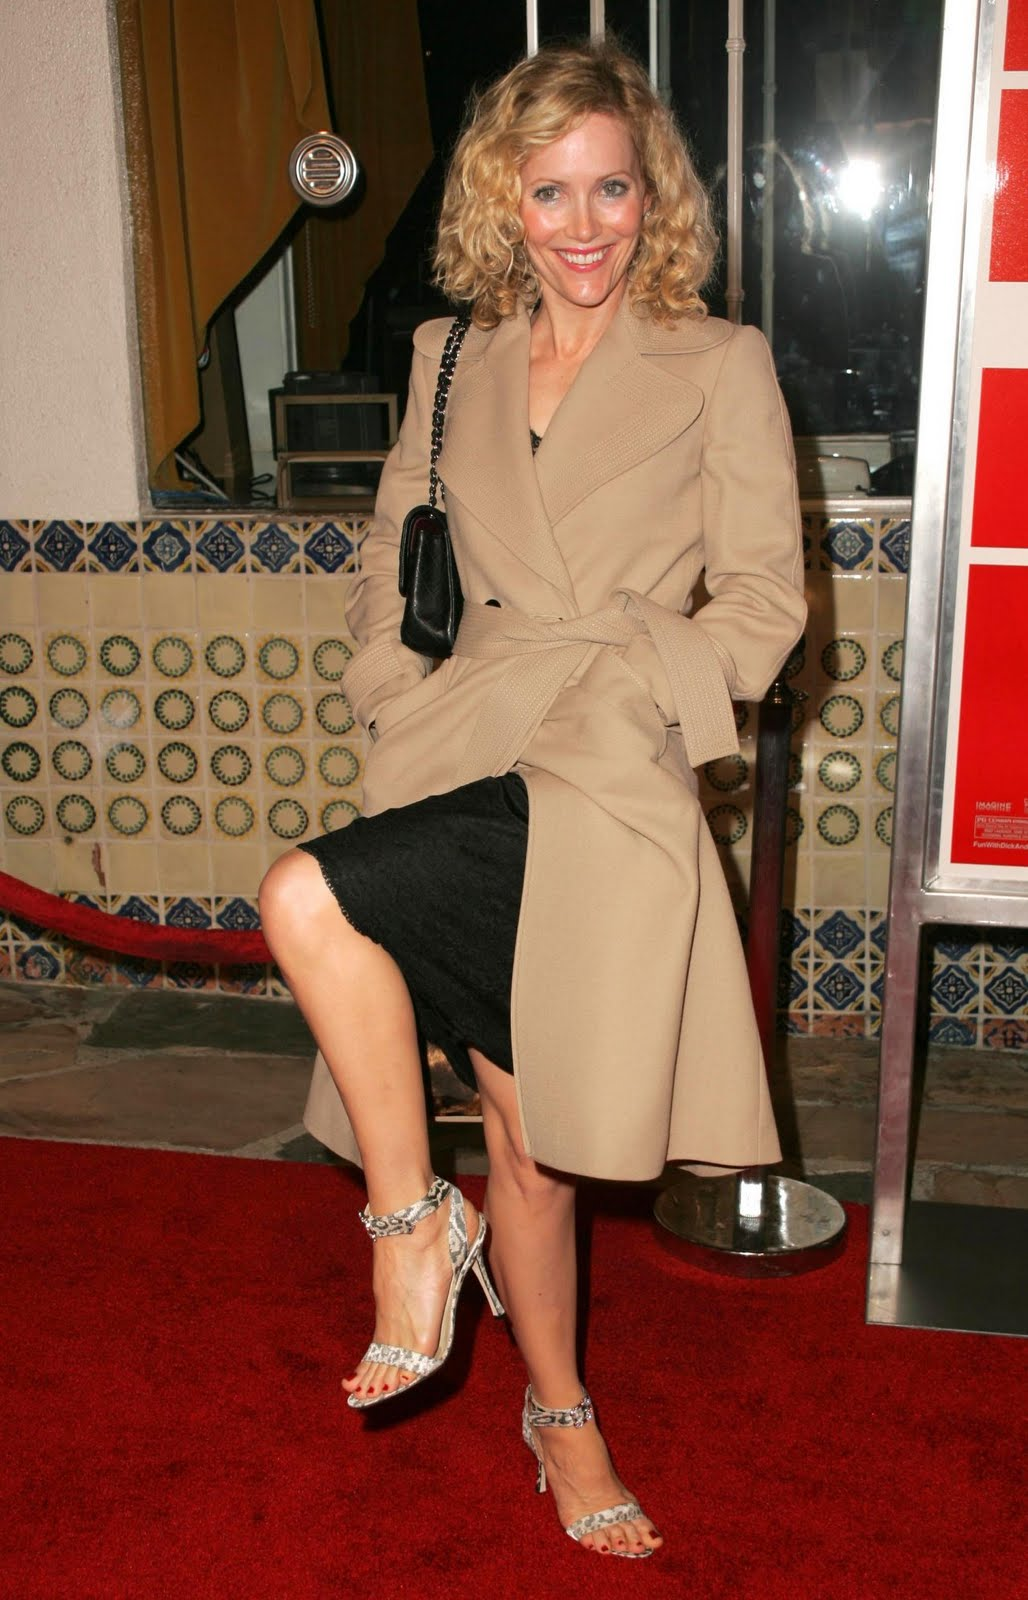 HAlLe Beauty Blog: Leslie Mann Feet